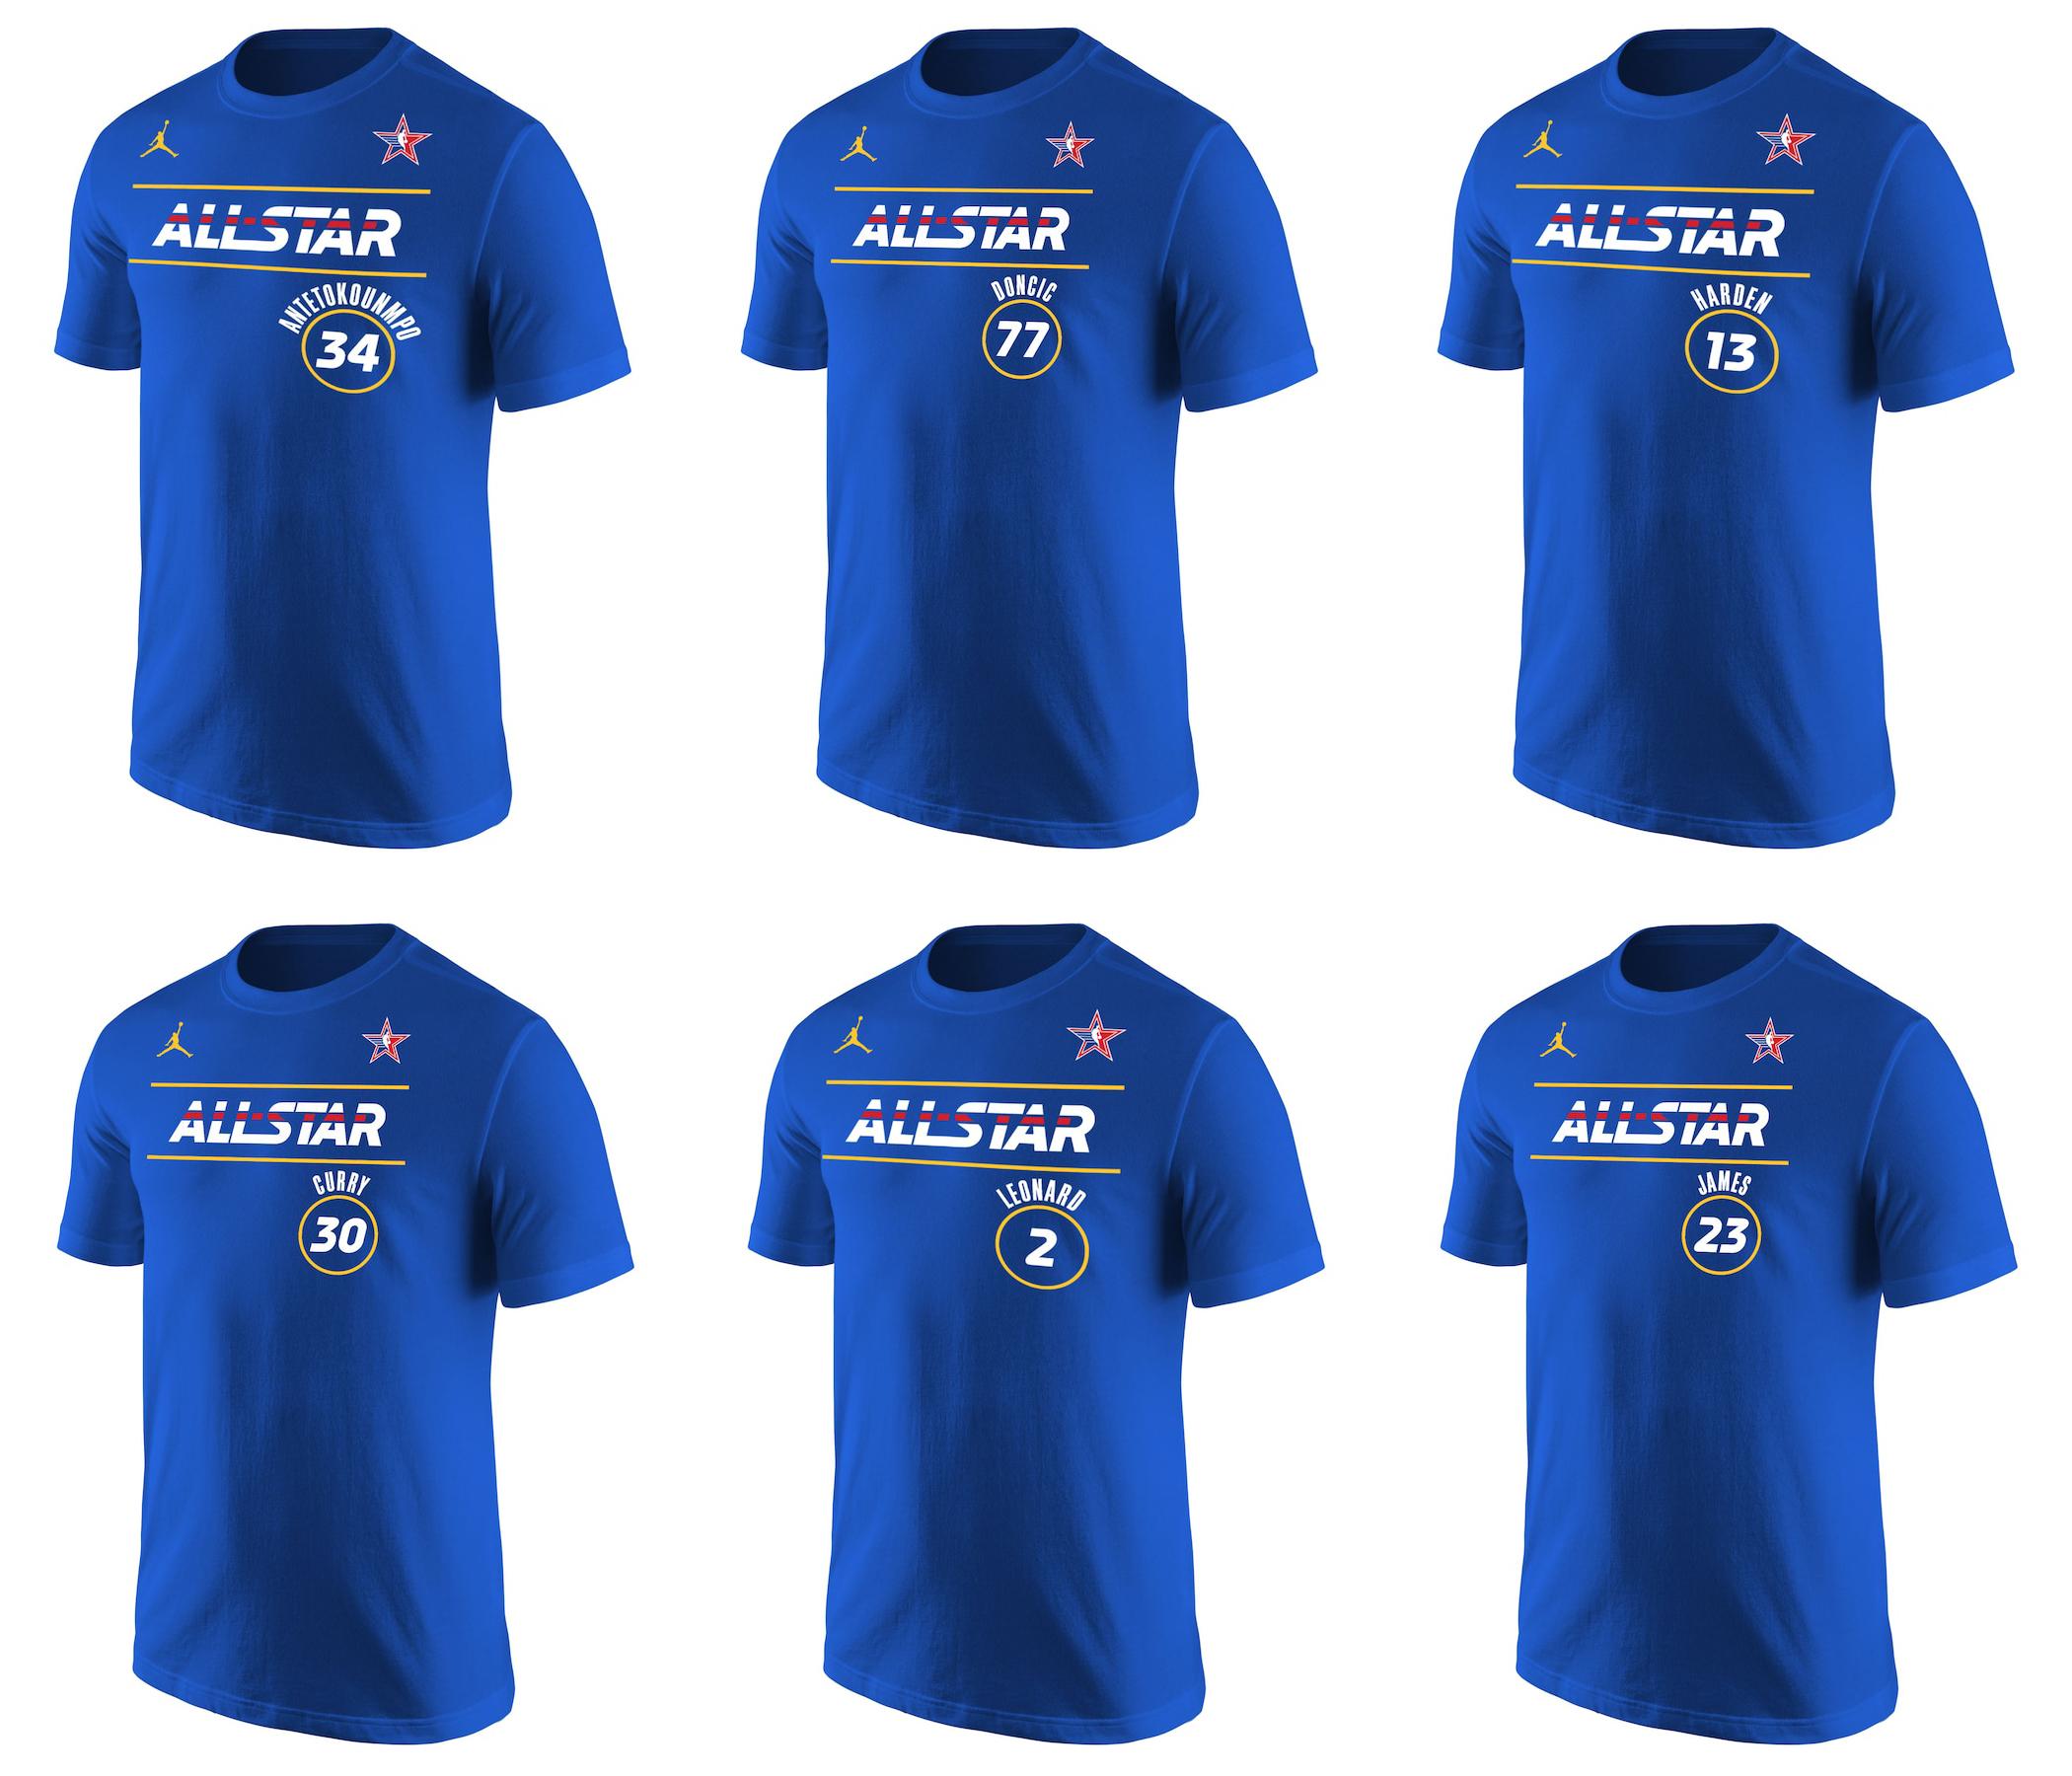 2021-nba-all-star-game-jordan-player-shirts